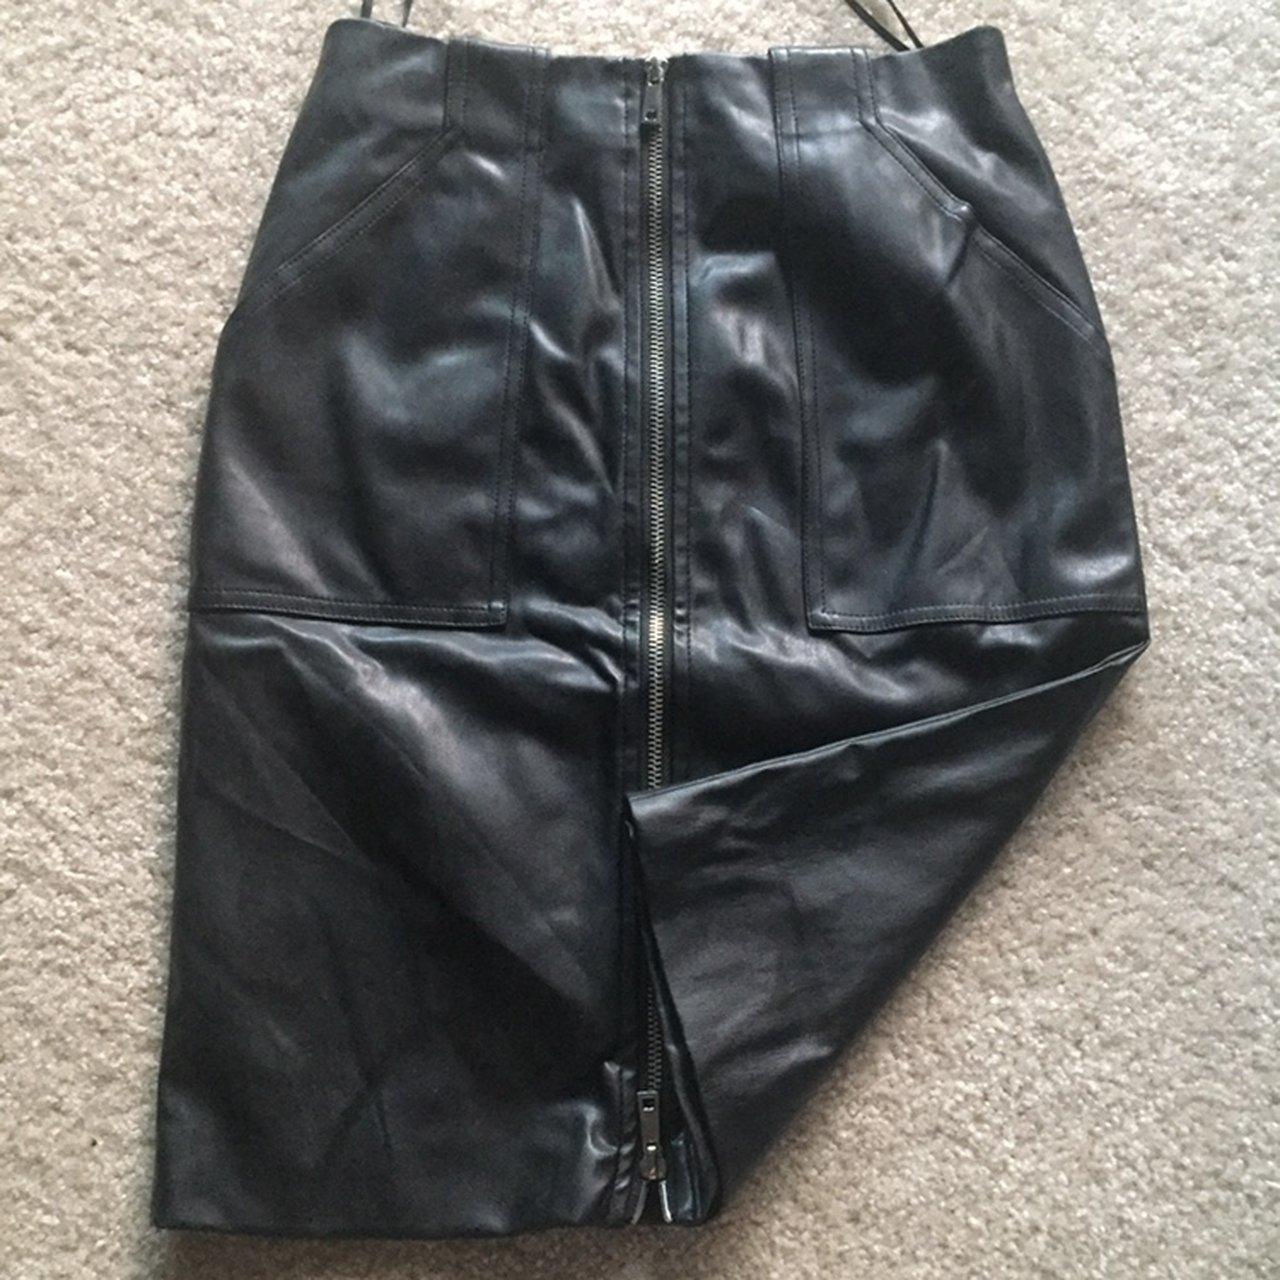 black pleather pencil skirt,  second hand $13.25 on depop